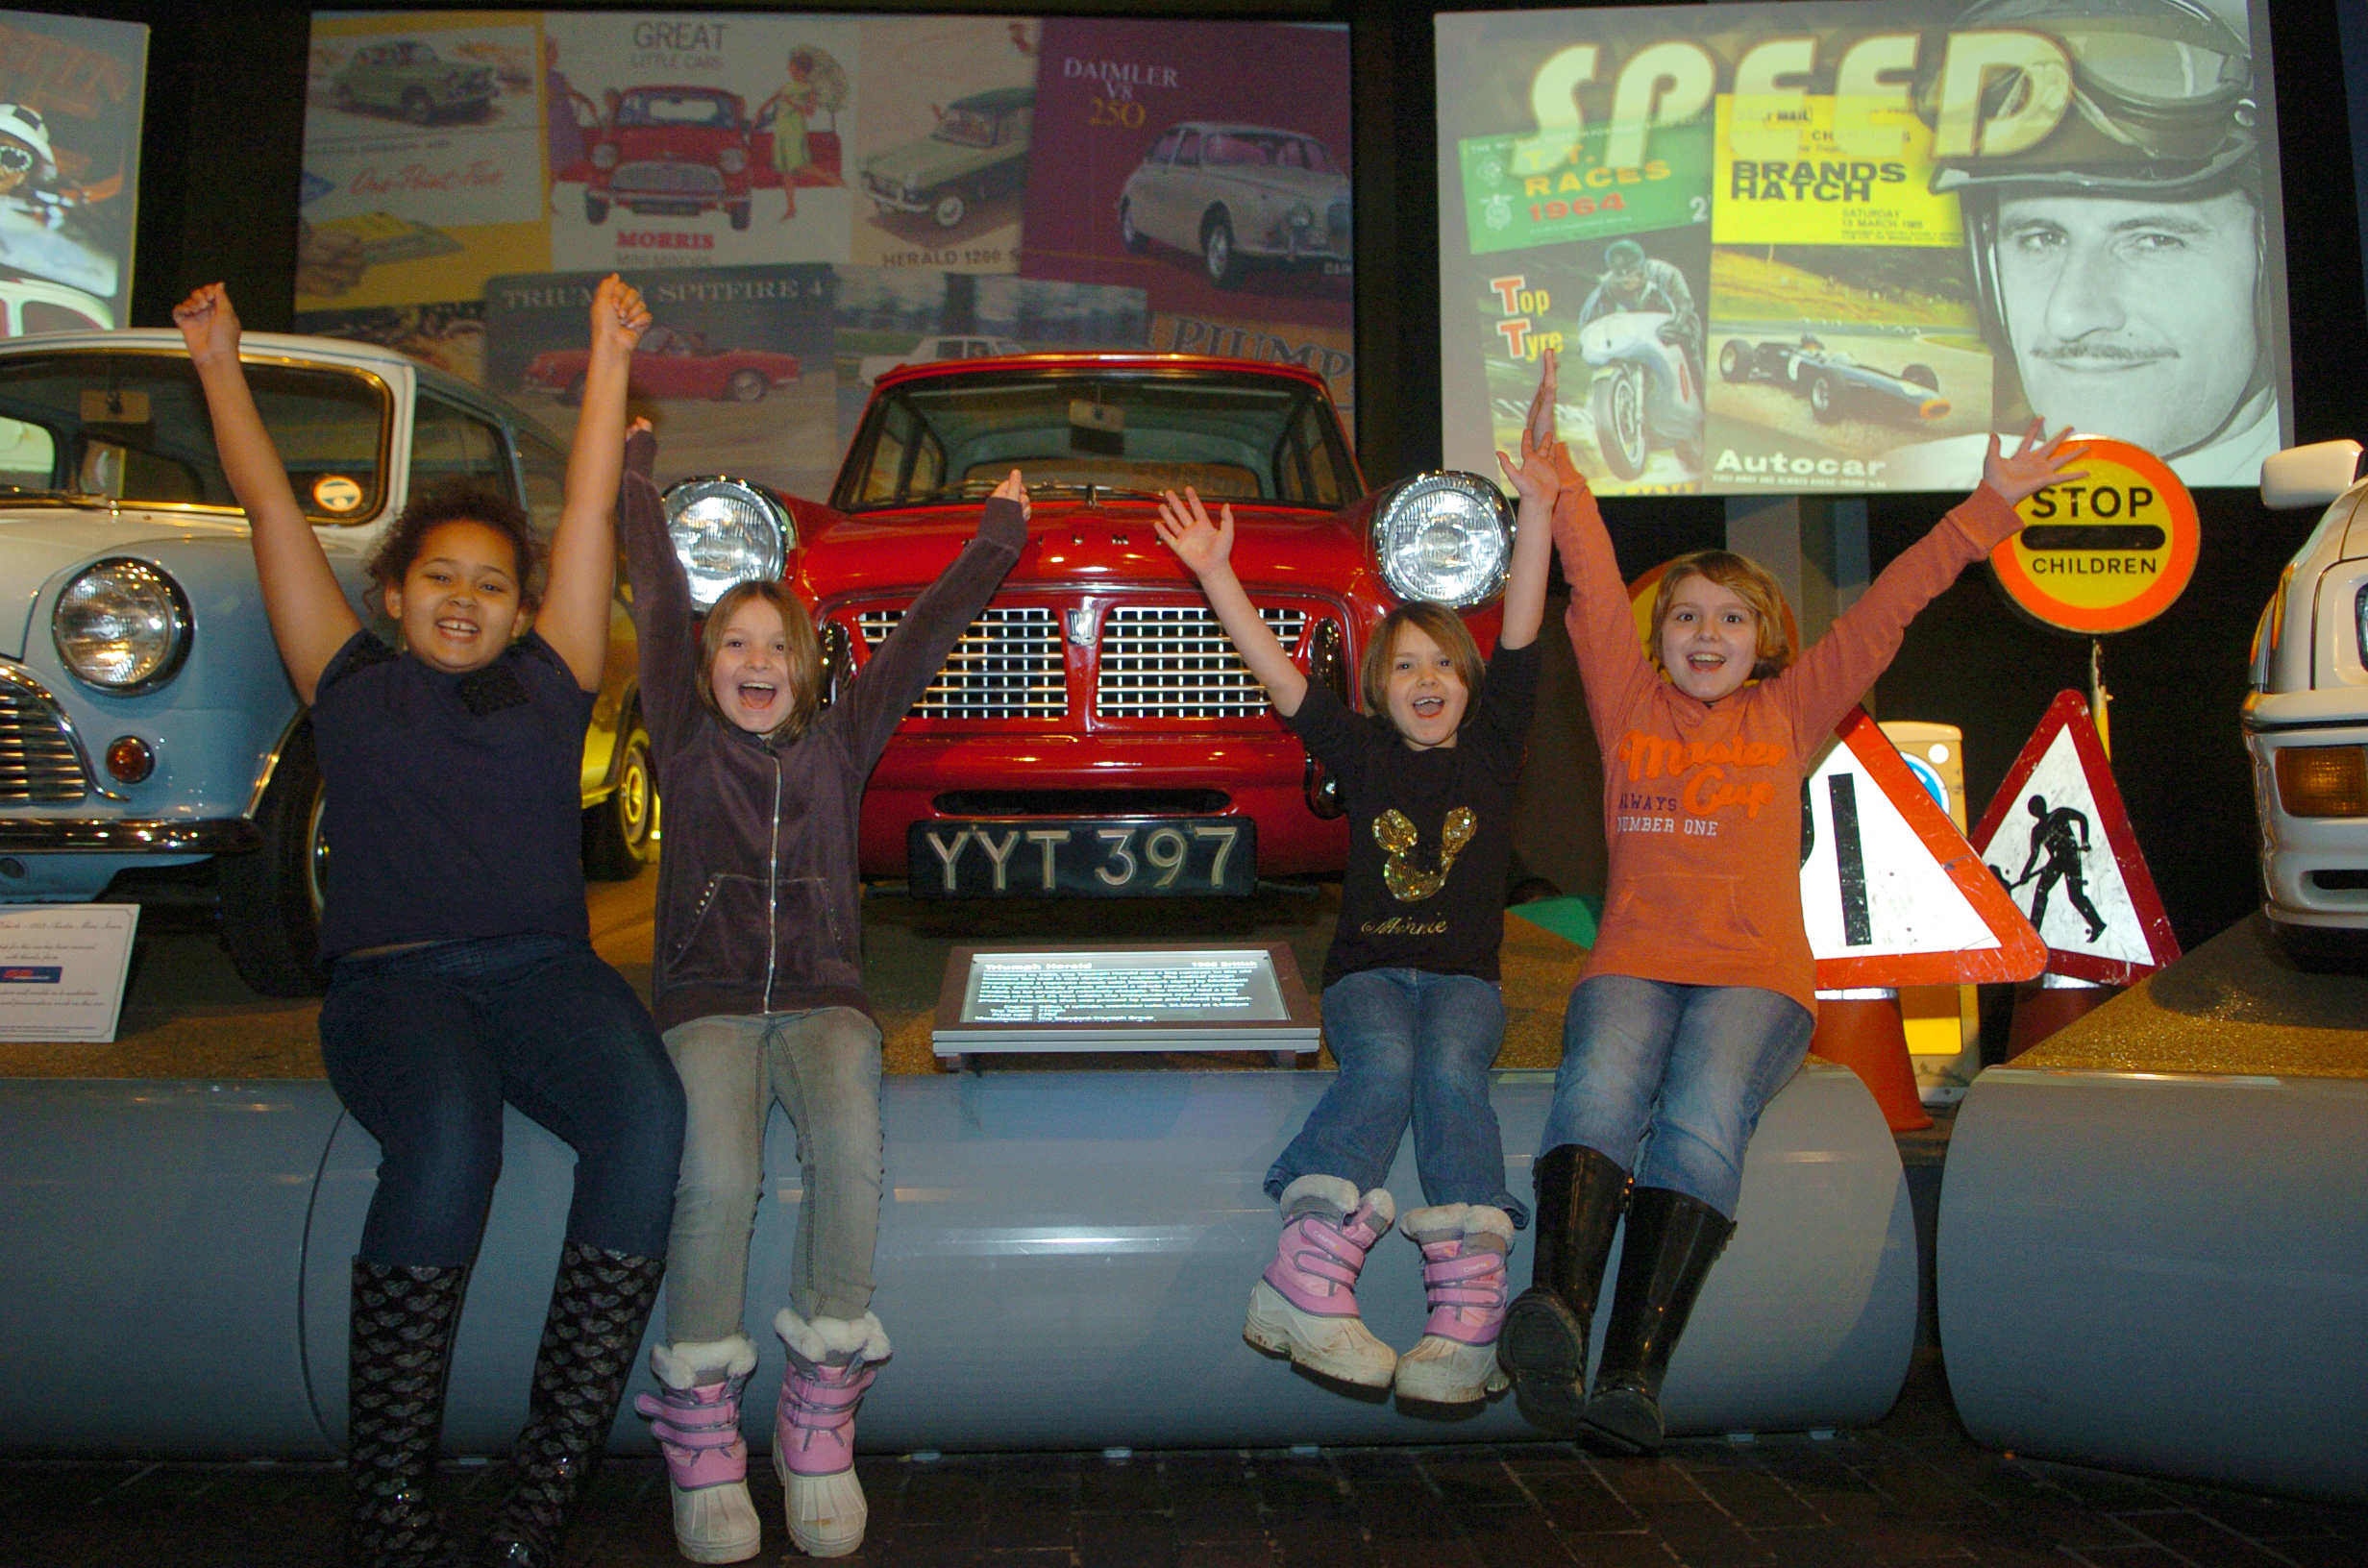 blog/196/Kids in cars_visiting Beaulieu museum